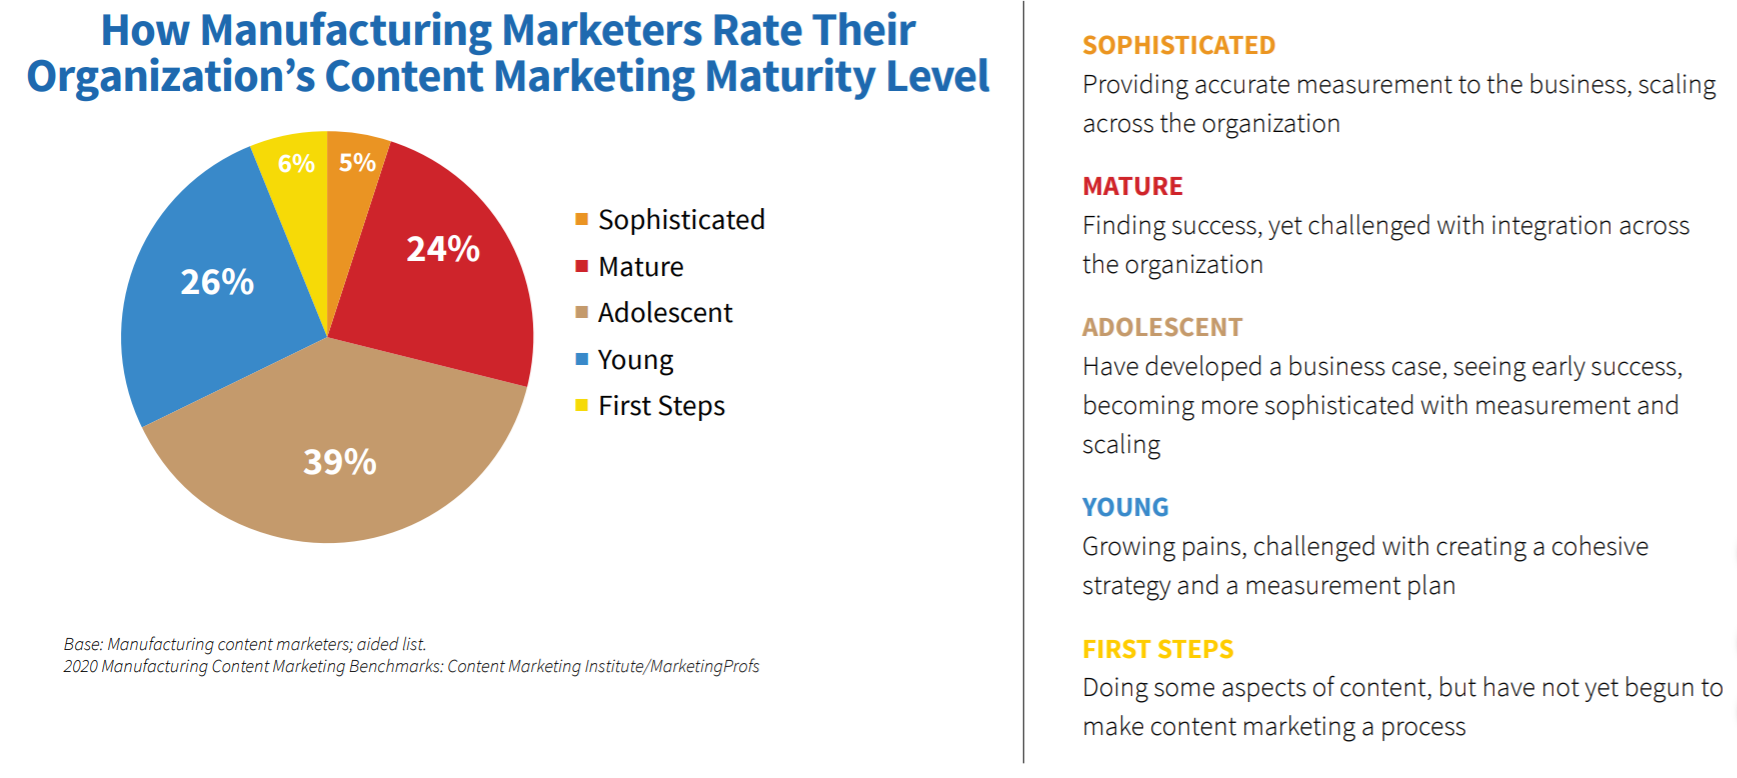 content-marketing-strategy-maturity-level